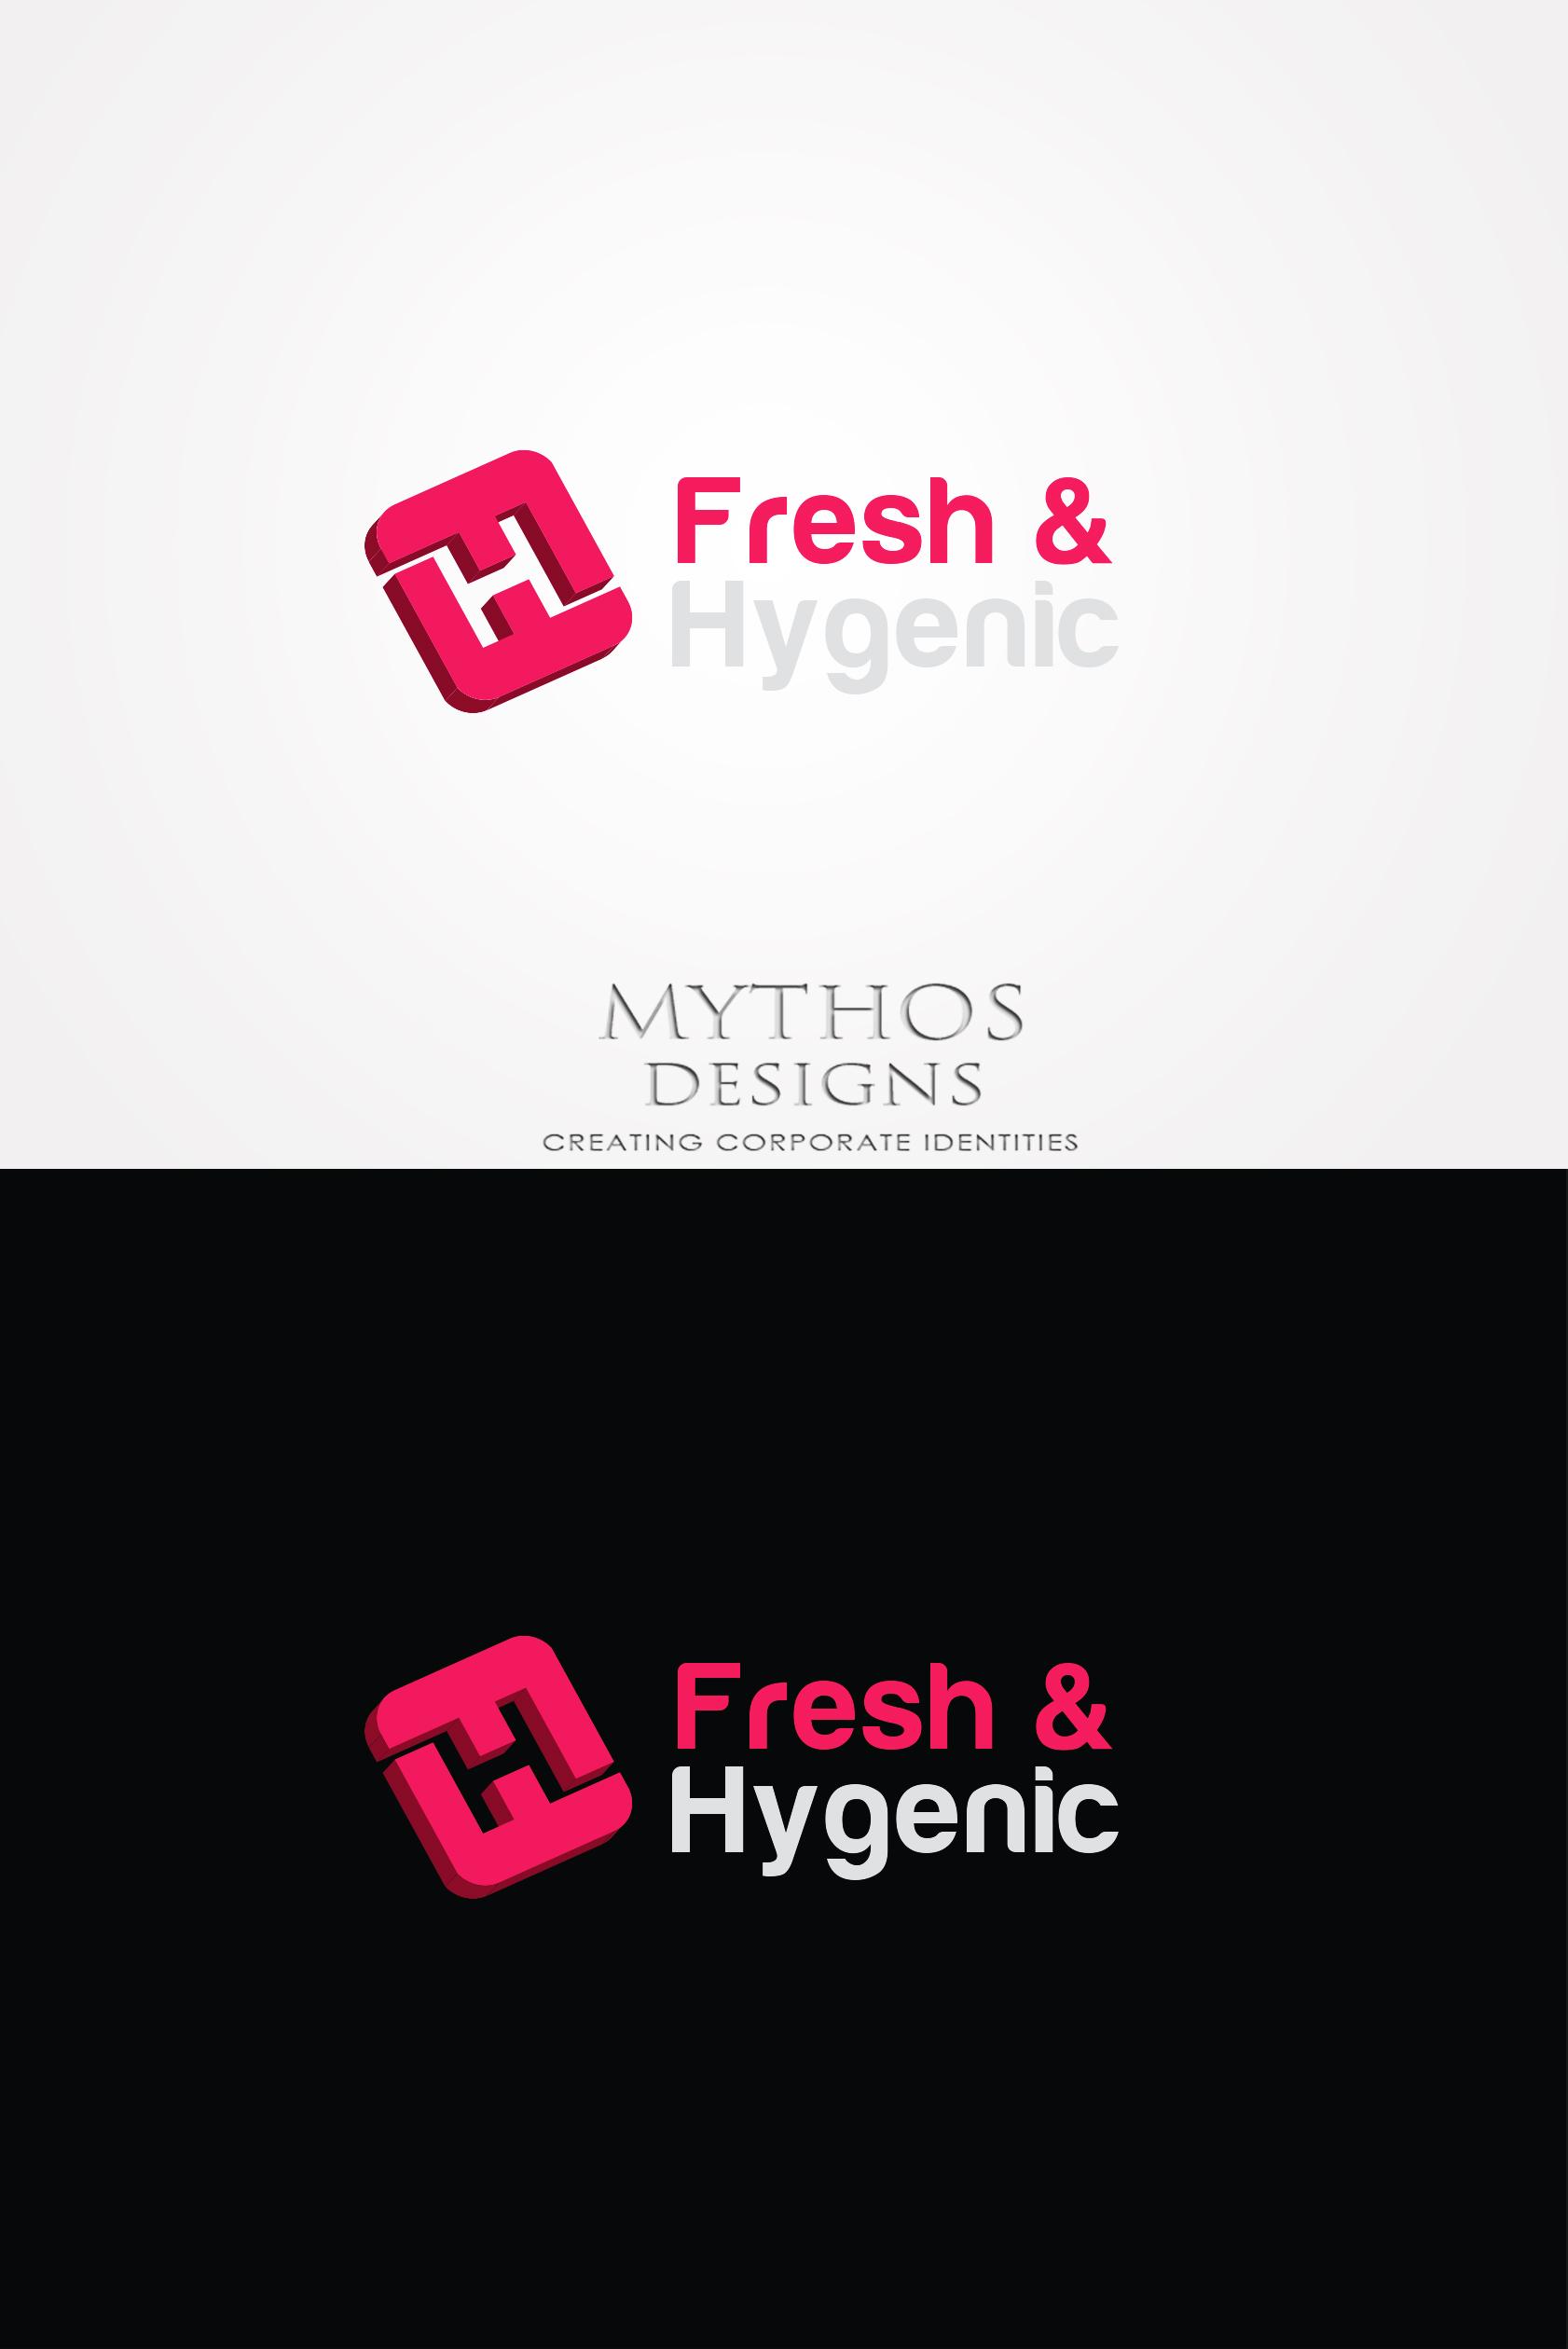 Logo Design by Mythos Designs - Entry No. 158 in the Logo Design Contest Fun Logo Design for Fresh & Hygenic.